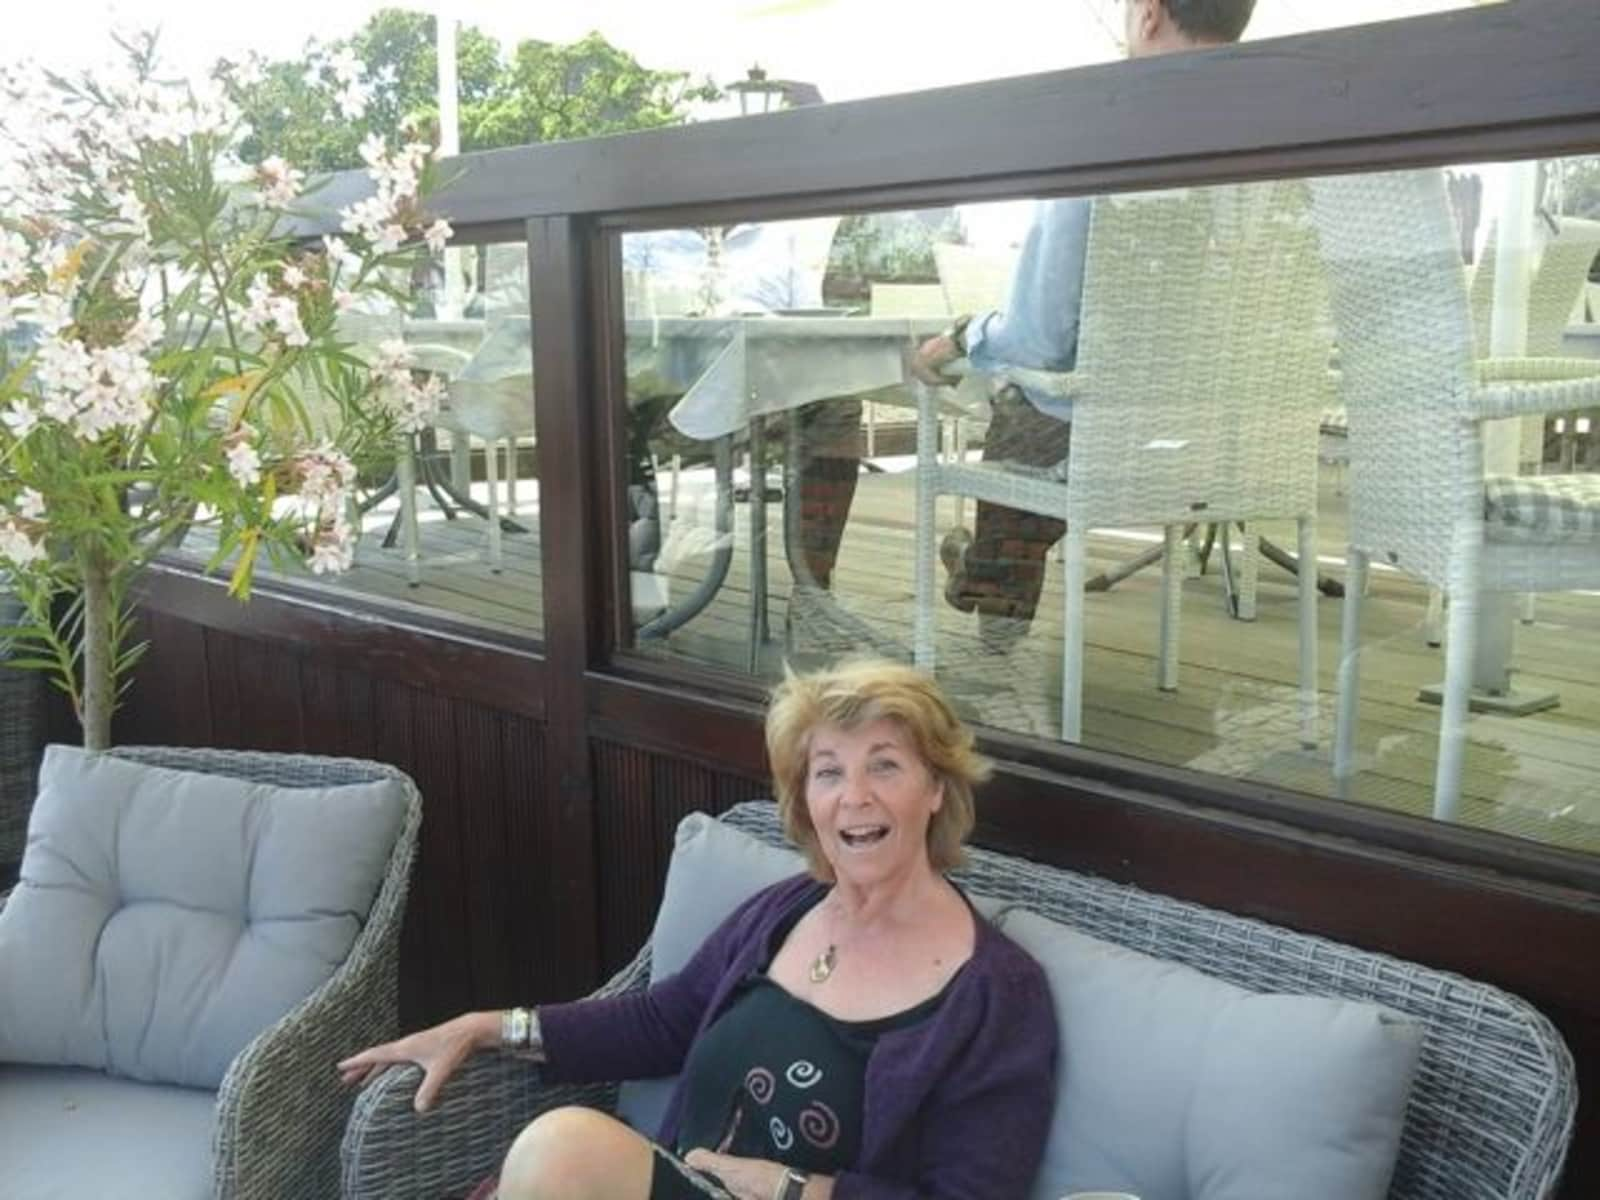 Elisabeth from Tournai, Belgium